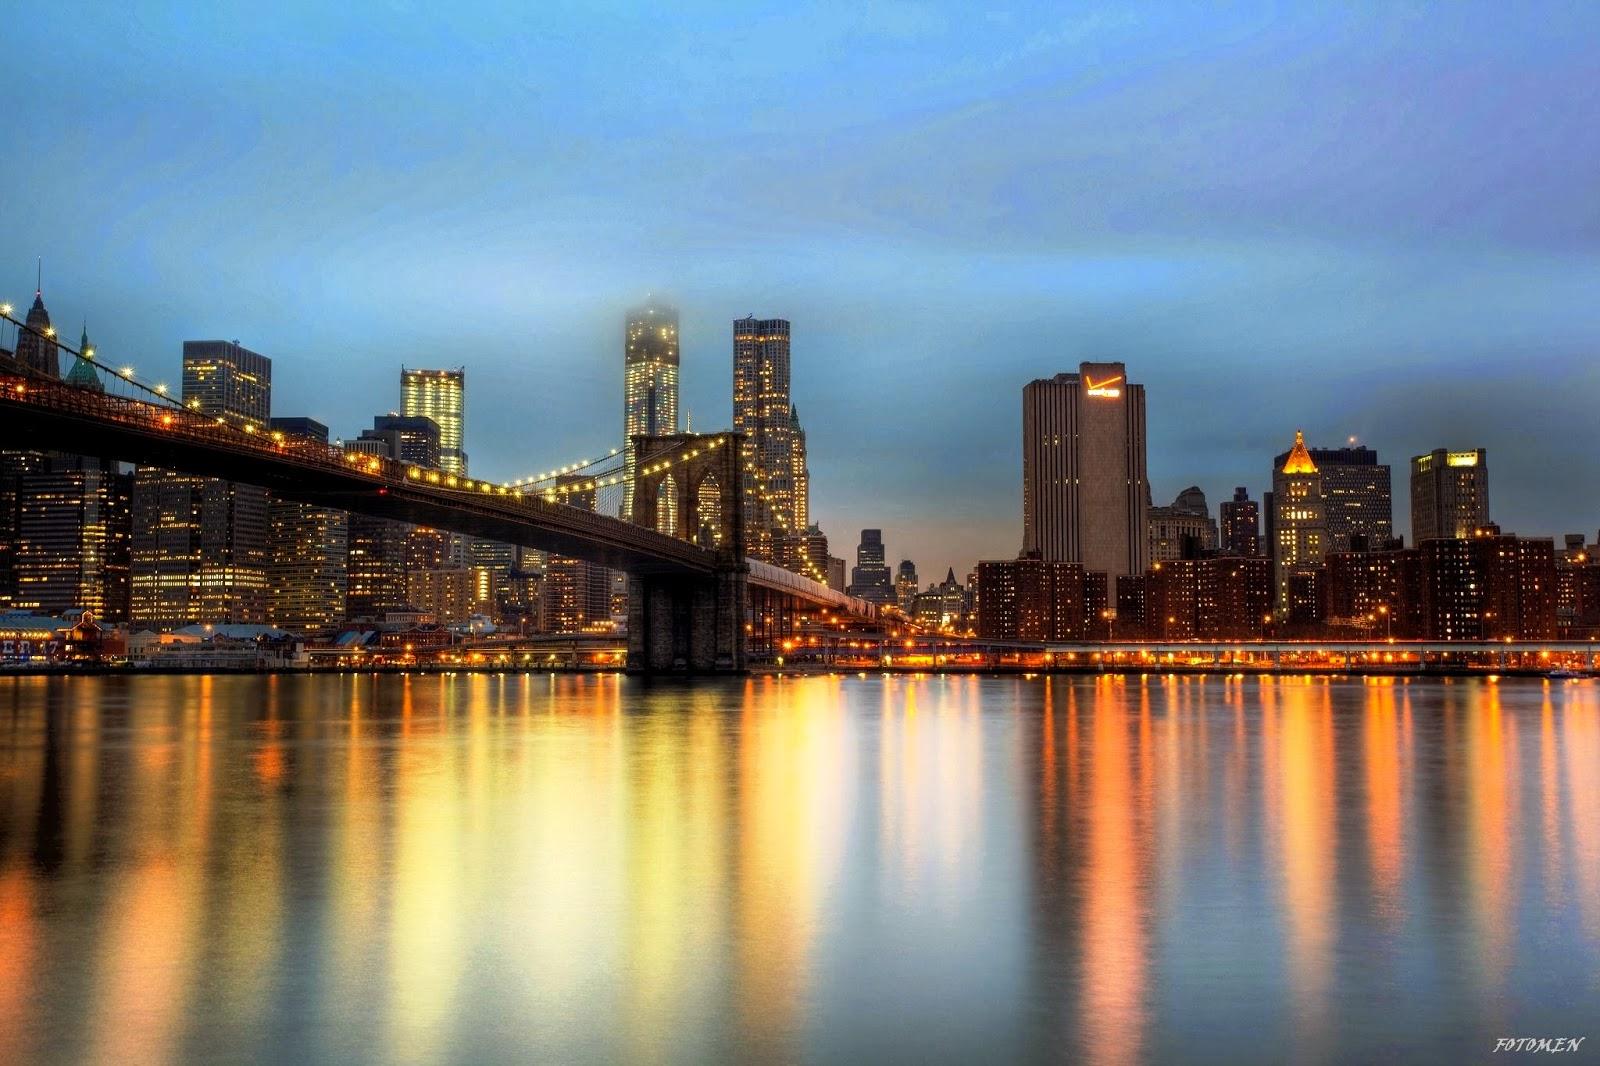 38 brooklyn new york wallpaper on wallpapersafari for Immagini desktop new york